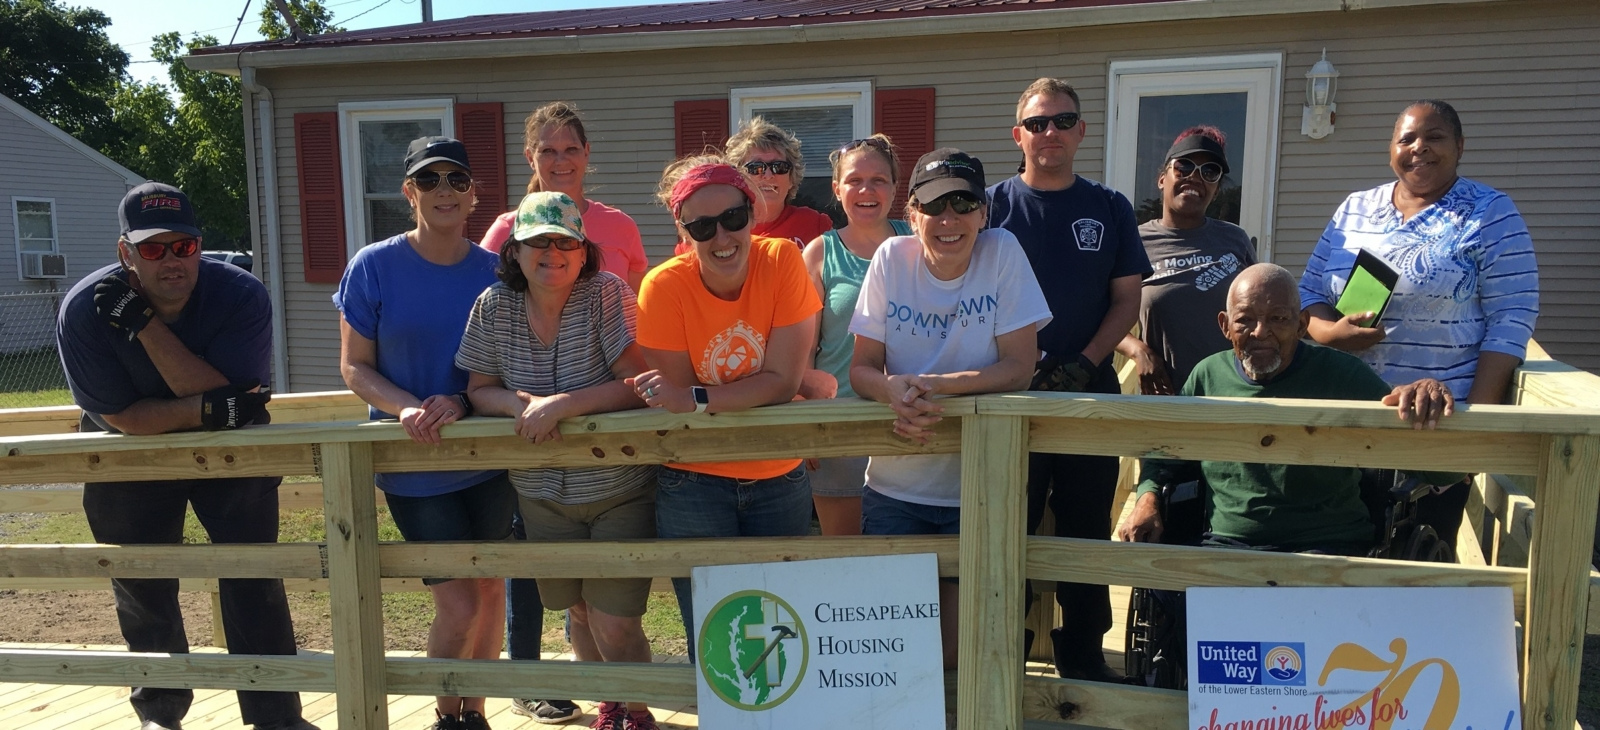 Volunteers help a neighbor by building a wheelchair ramp